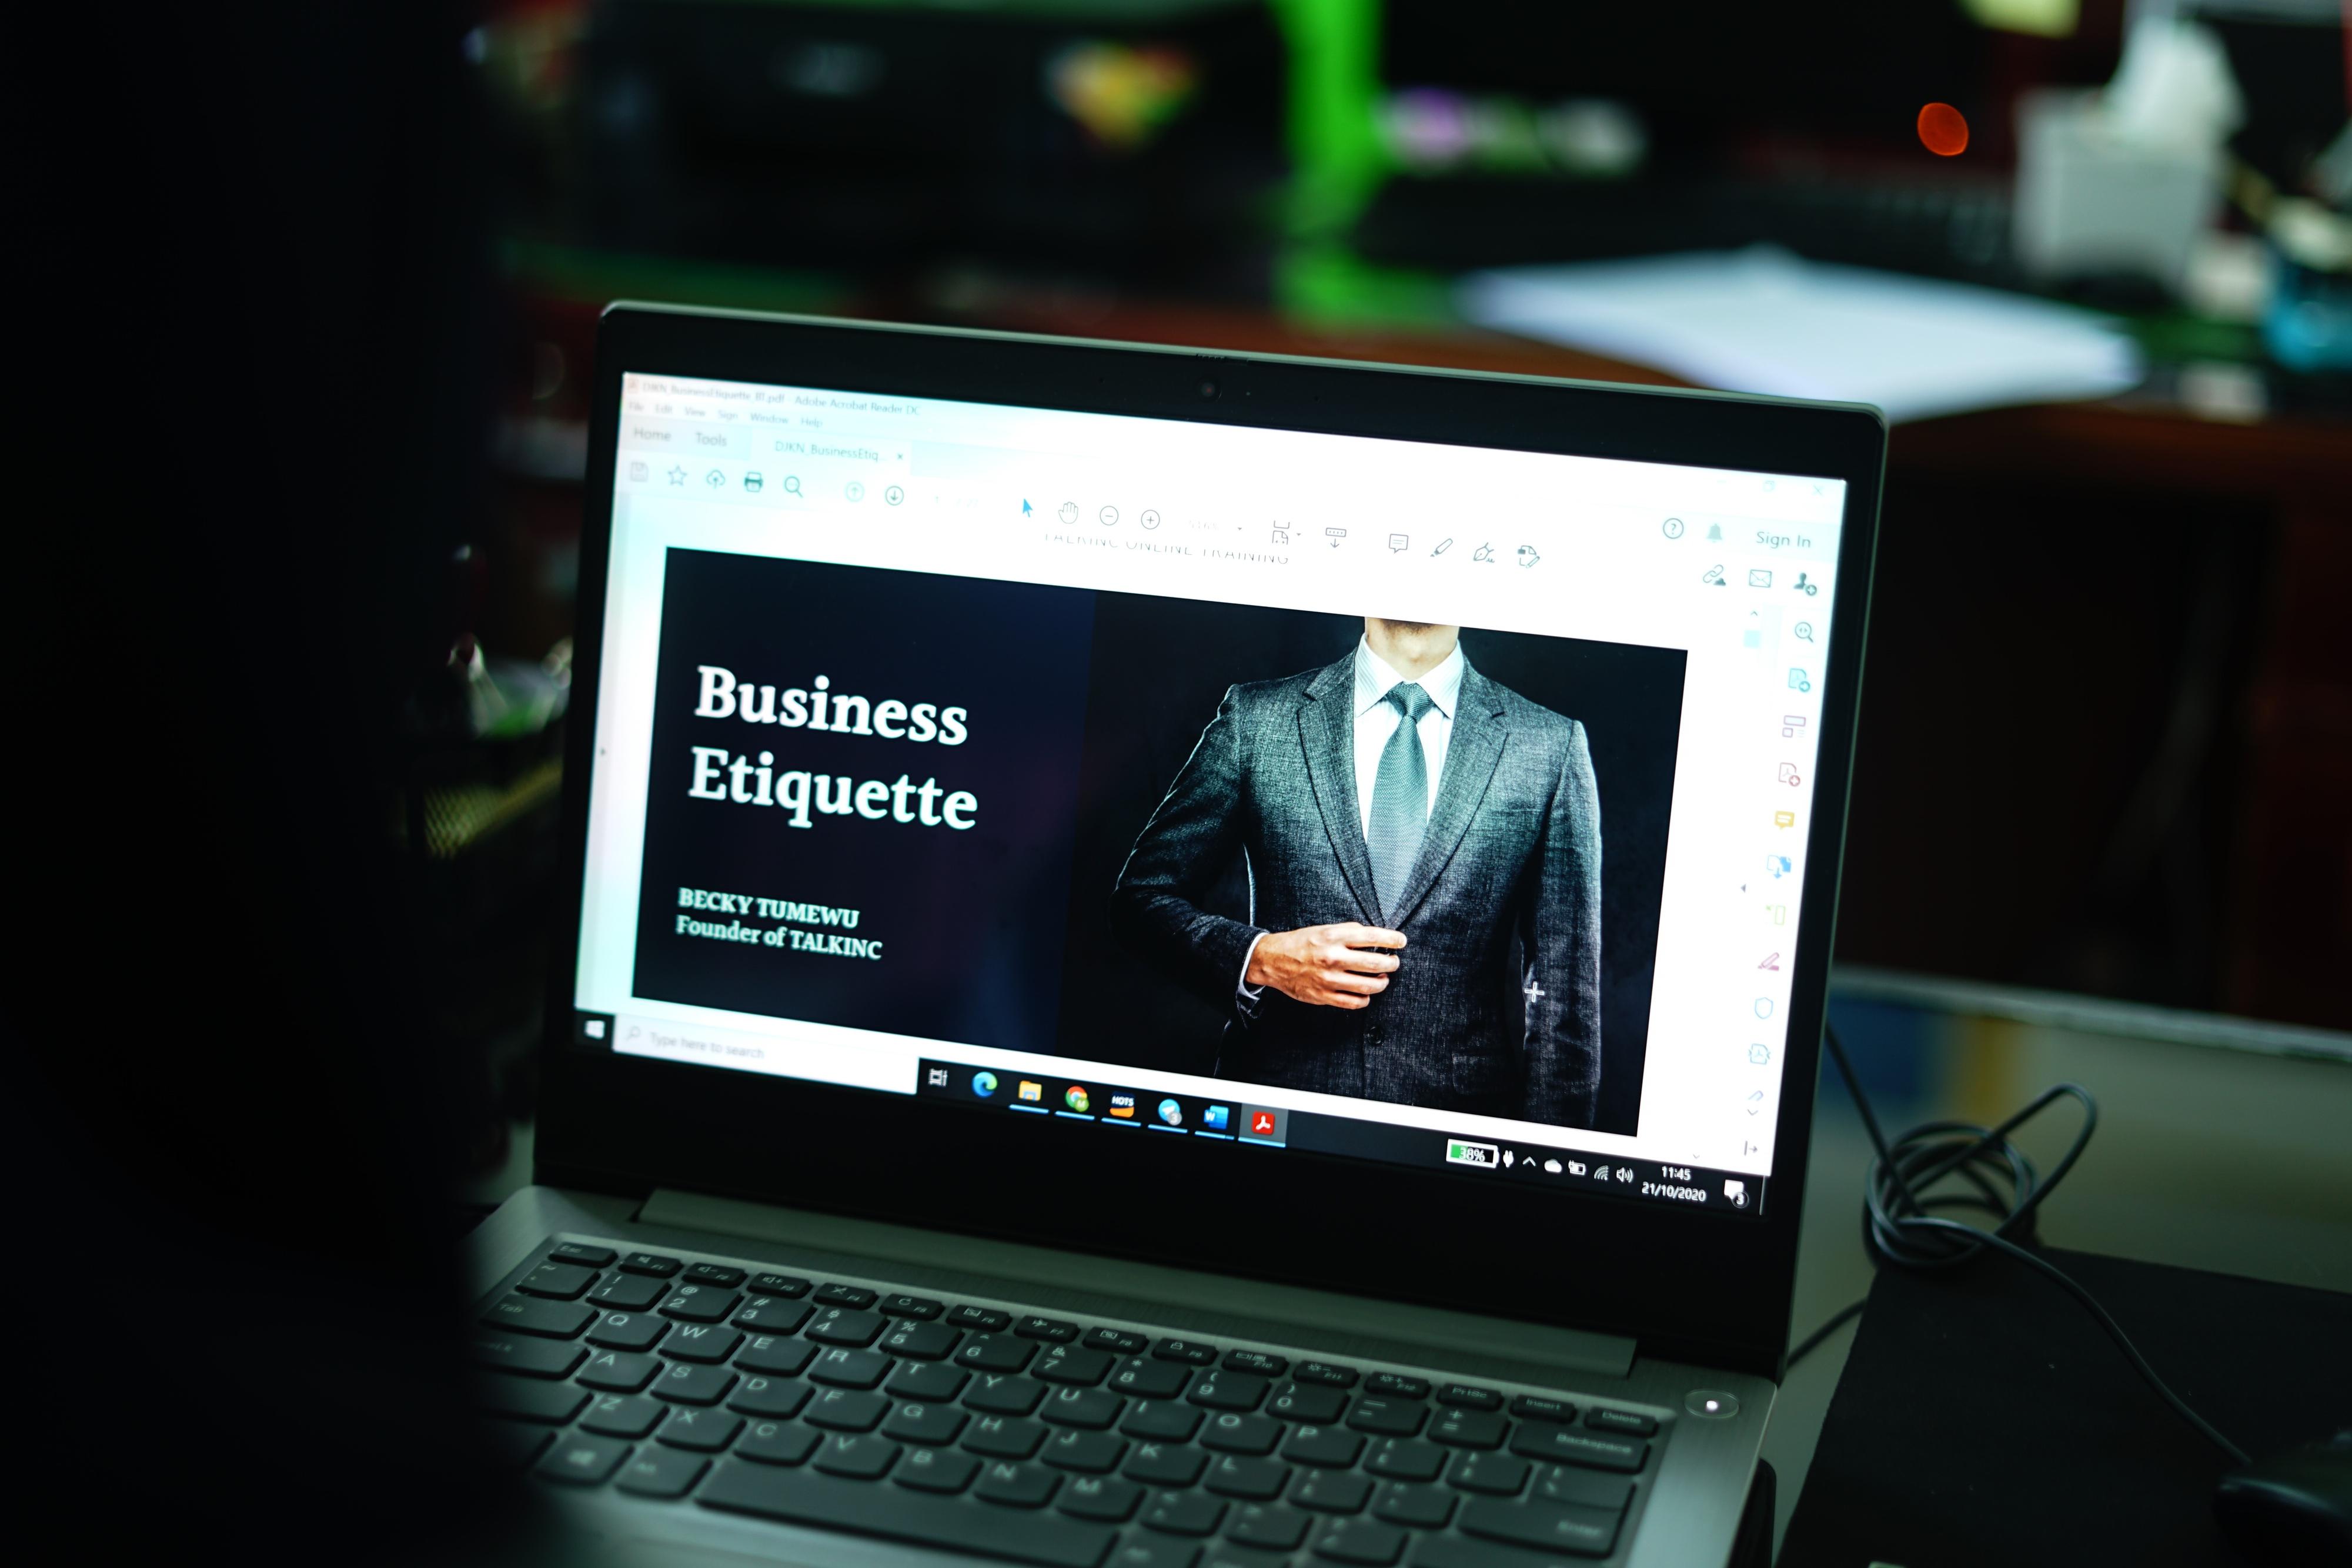 Business Etiquette Communication Skills, Part I